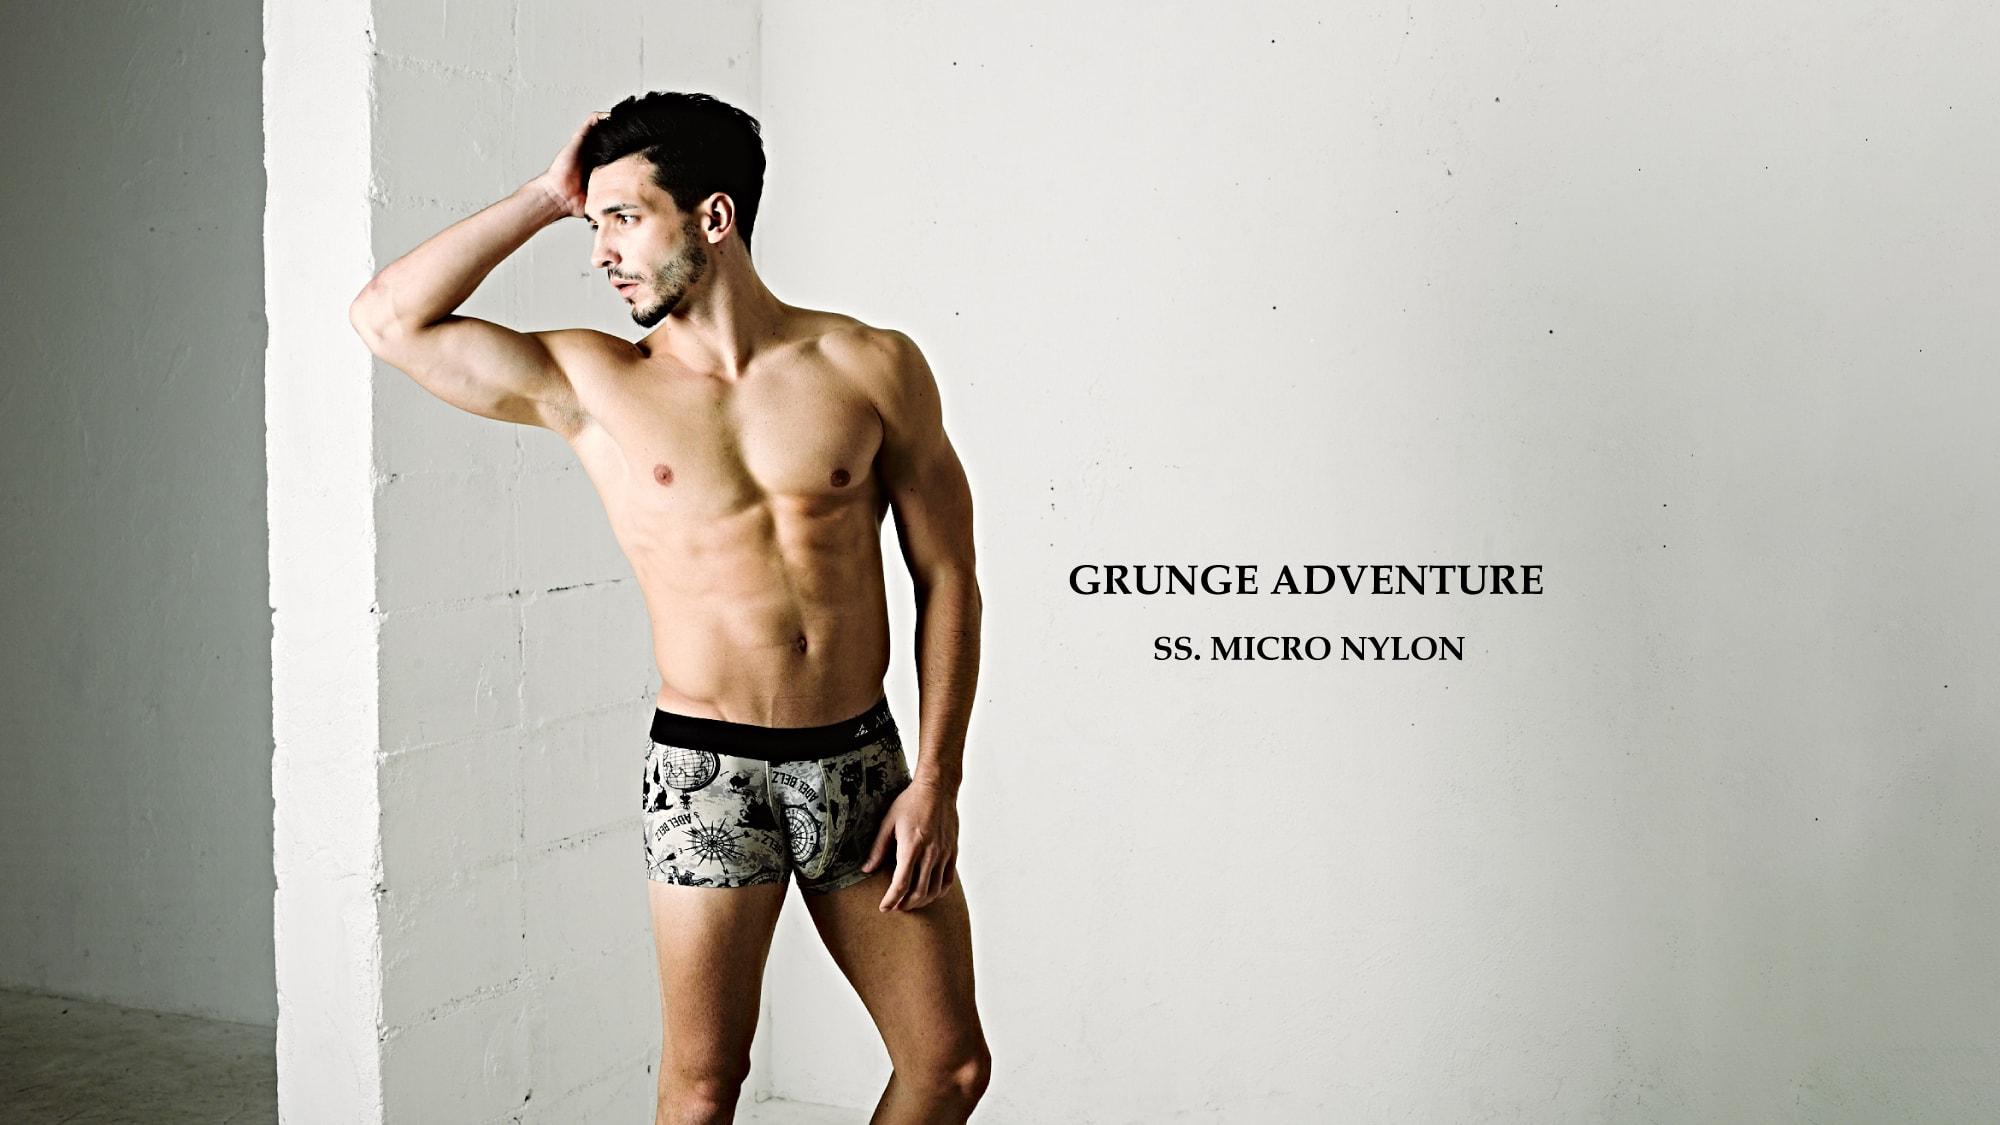 GRUNGE ADVENTURE |  アンダーウェア / 男性下着 高級メンズボクサーパンツブランド、Adelbelz(アデルベルツ)公式通販